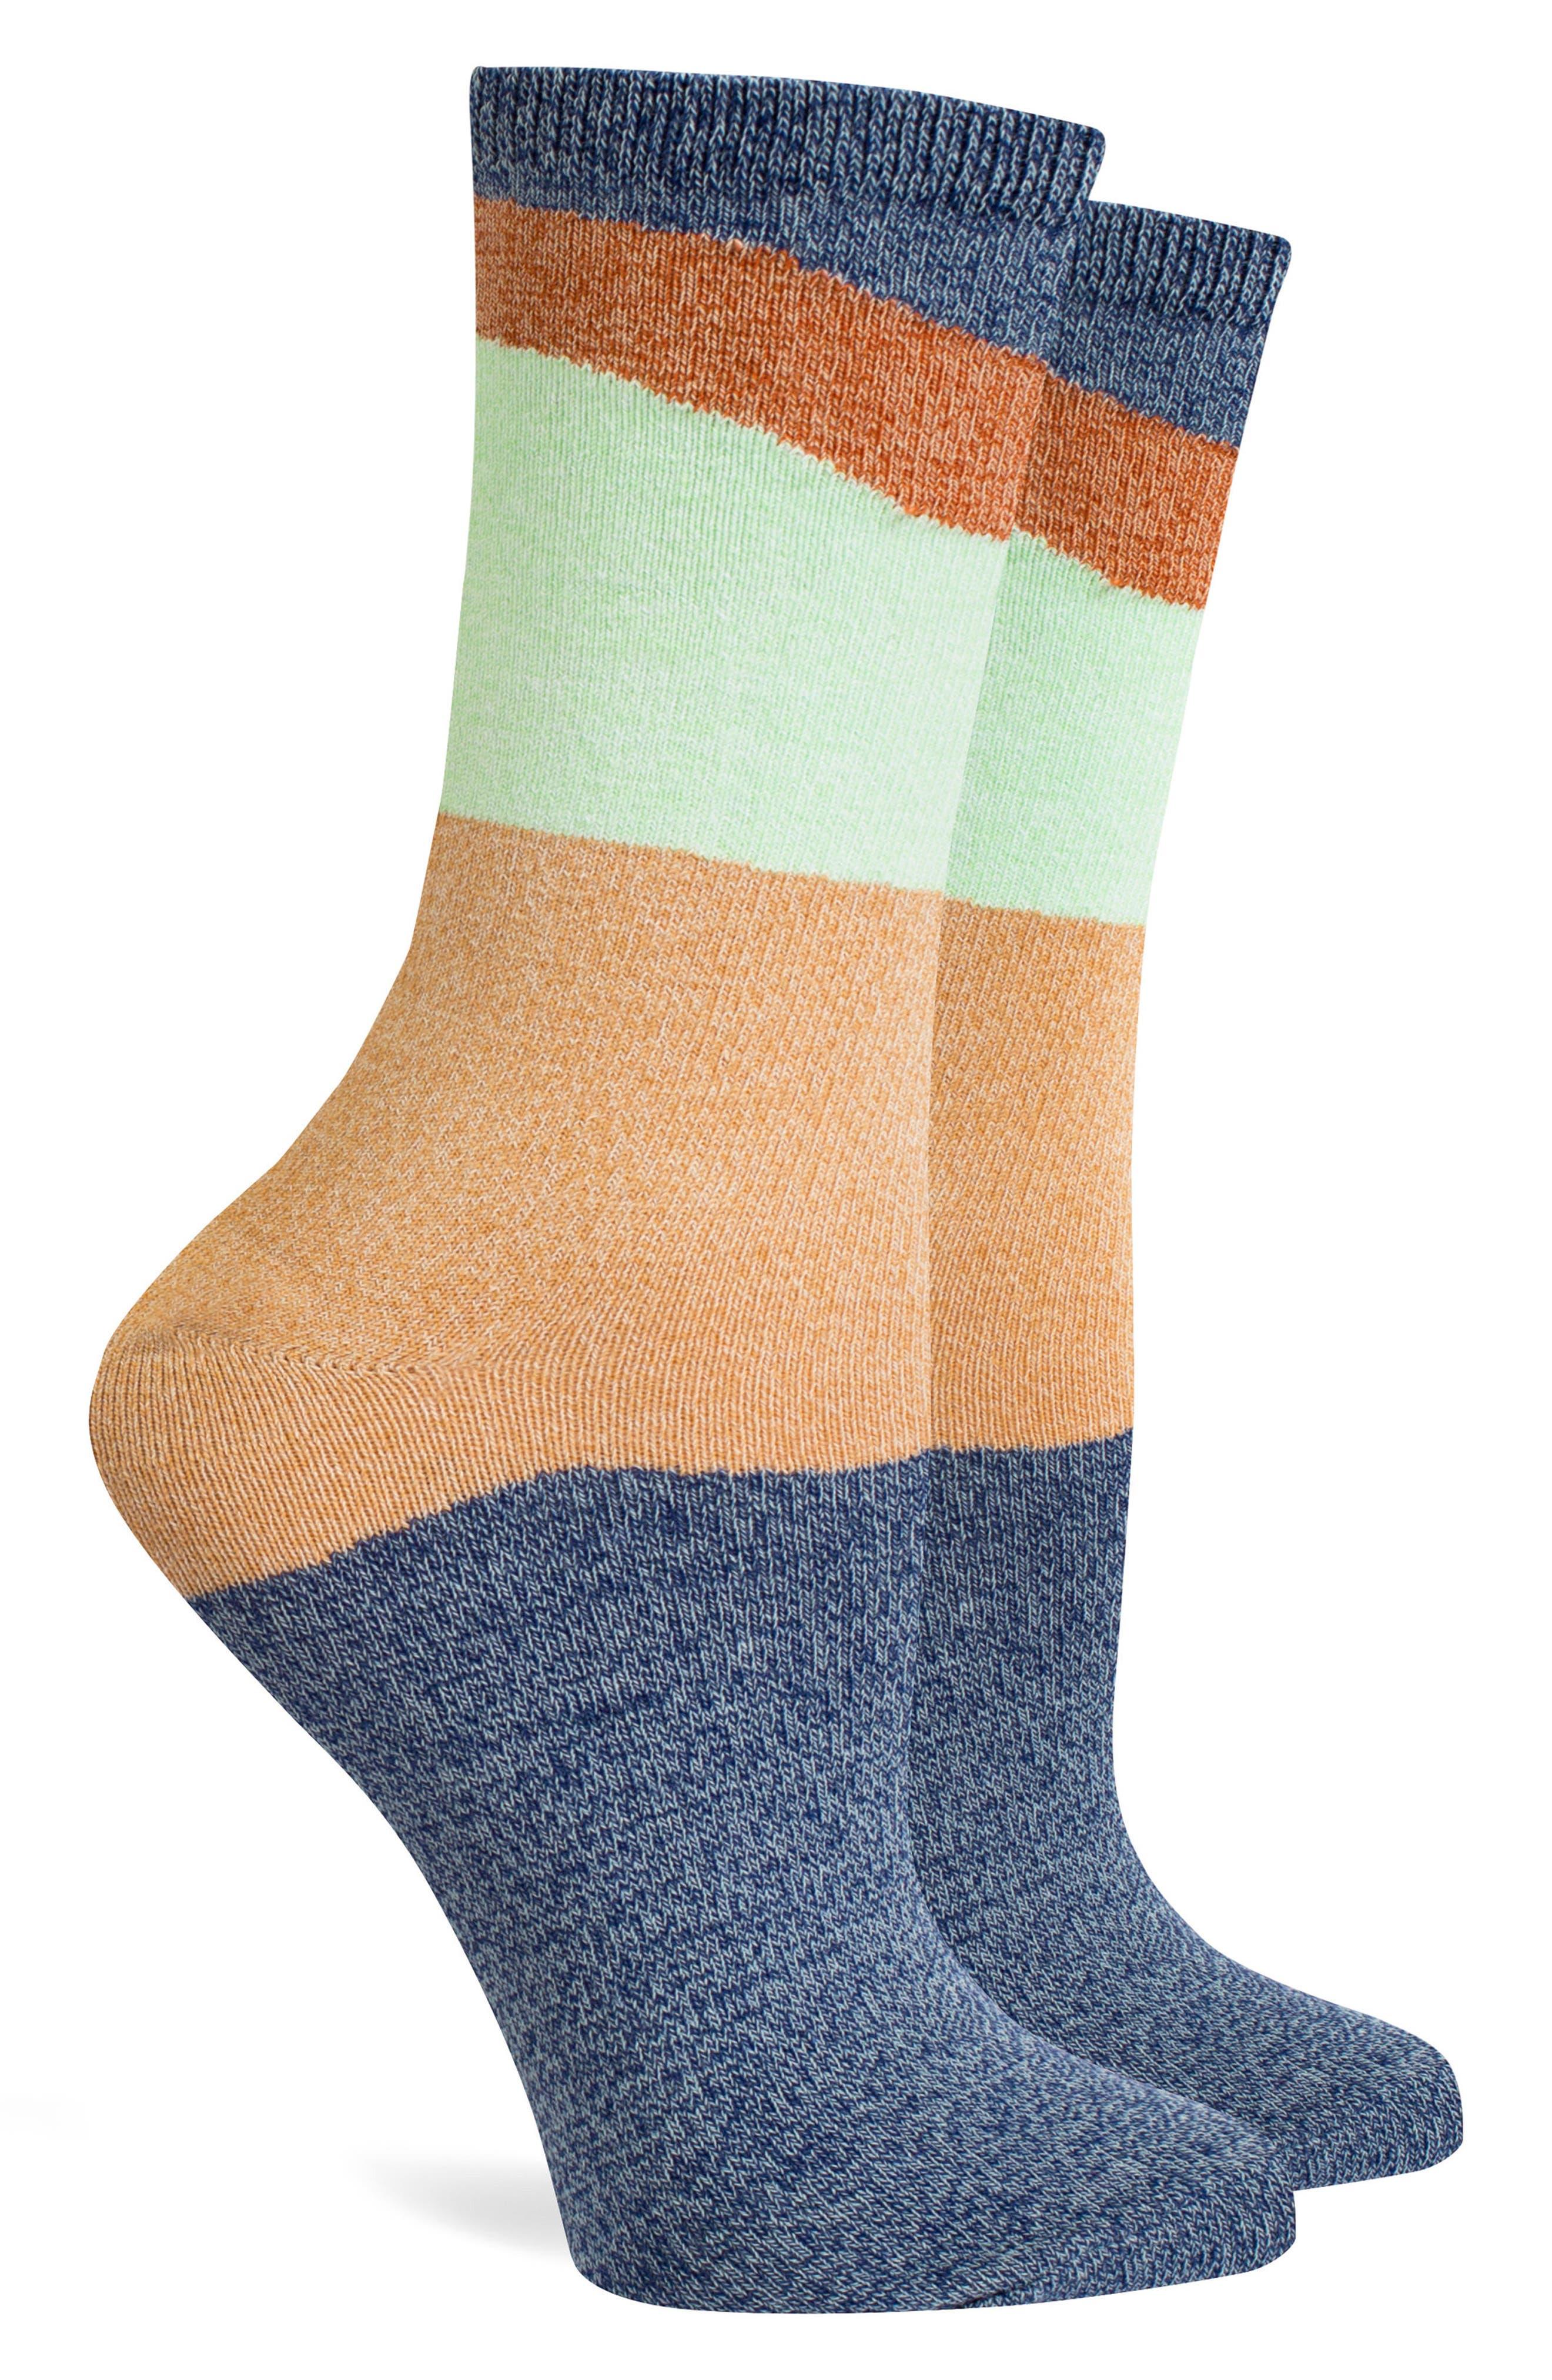 Addie Classic Crew Socks,                             Alternate thumbnail 2, color,                             Navy